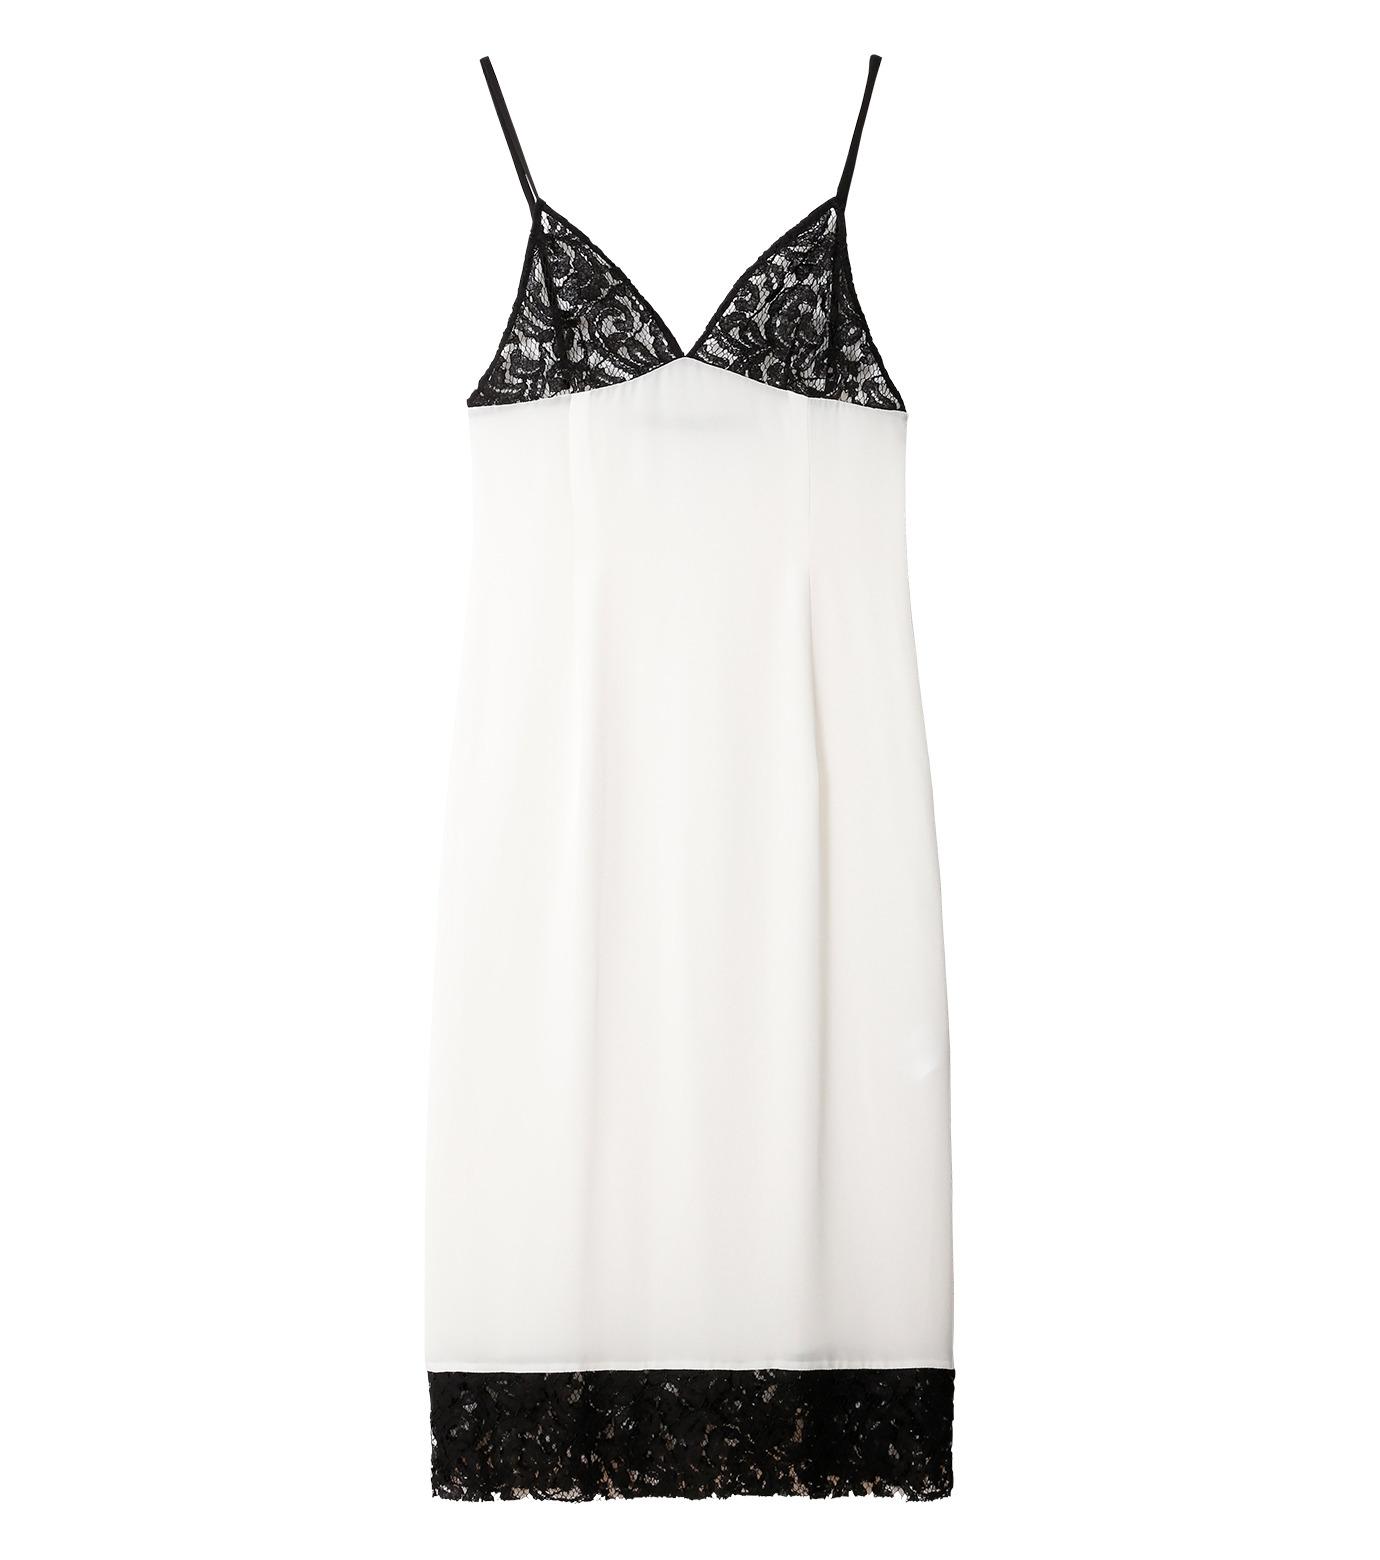 DRESSEDUNDRESSED(ドレスドアンドレスド)のSlip Dress-MULTI COLOUR(ワンピース/one piece)-DUW16190-9 拡大詳細画像1